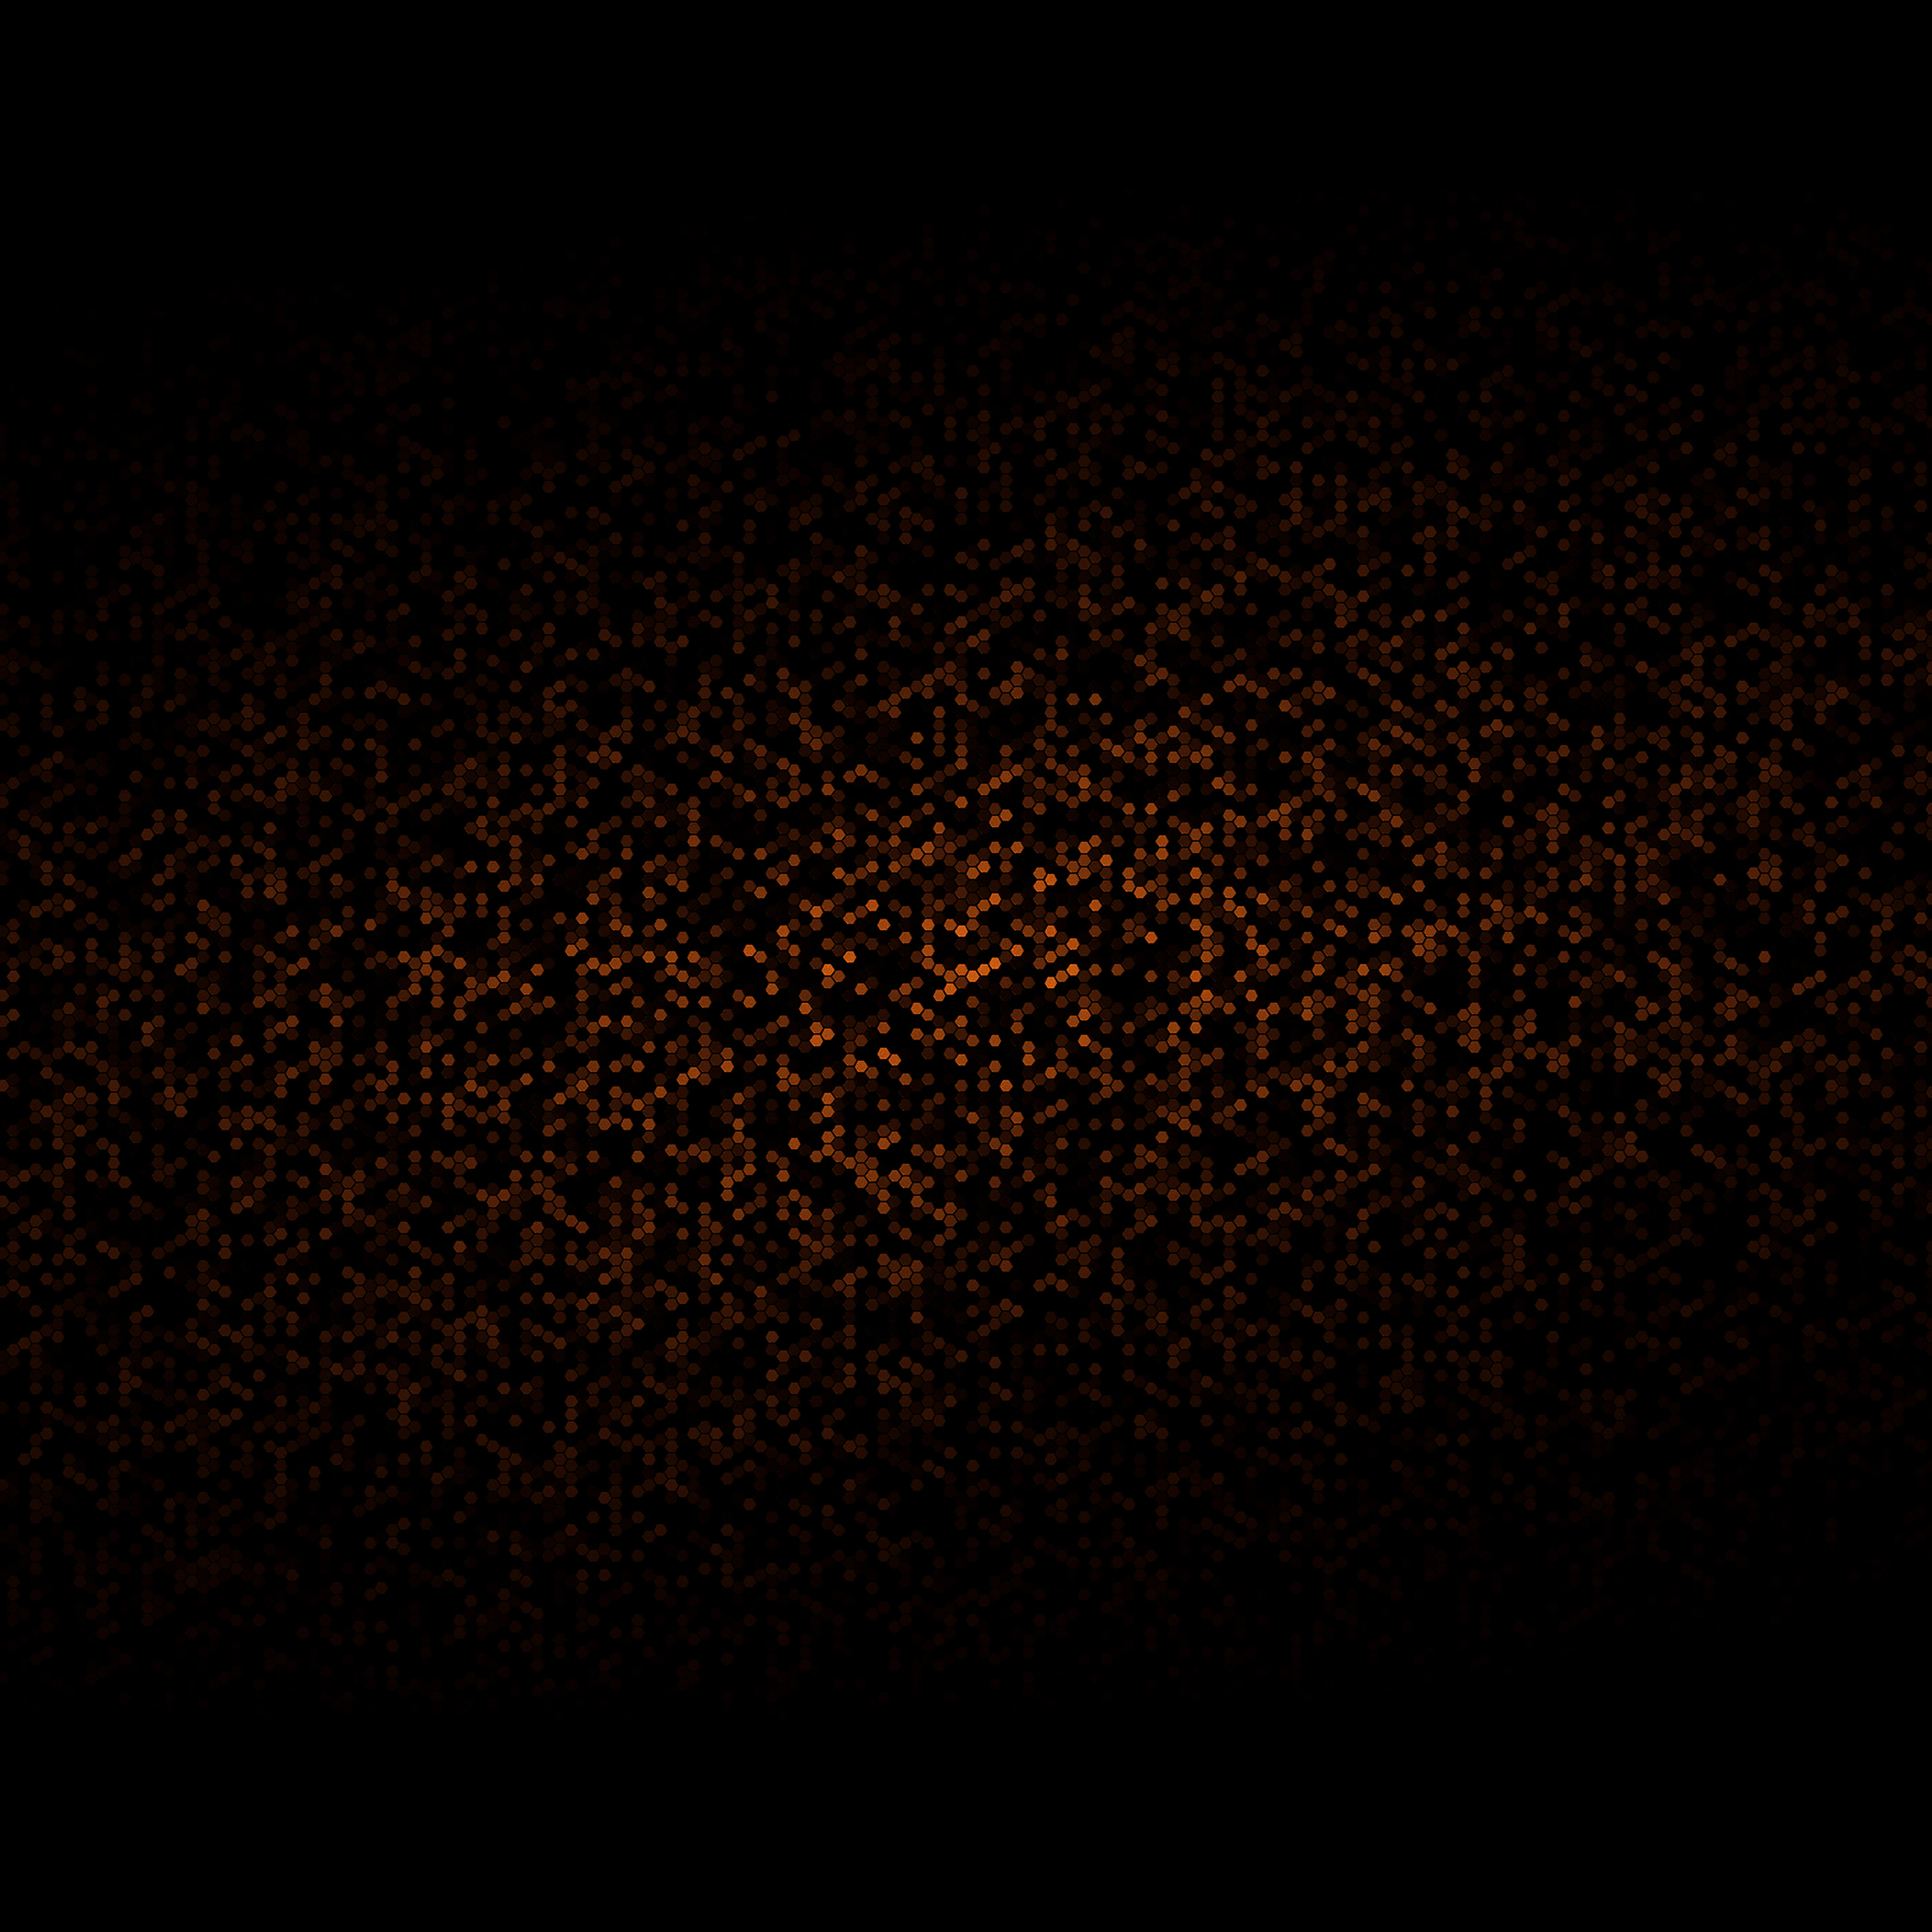 260 2608834 hd black orange abstract